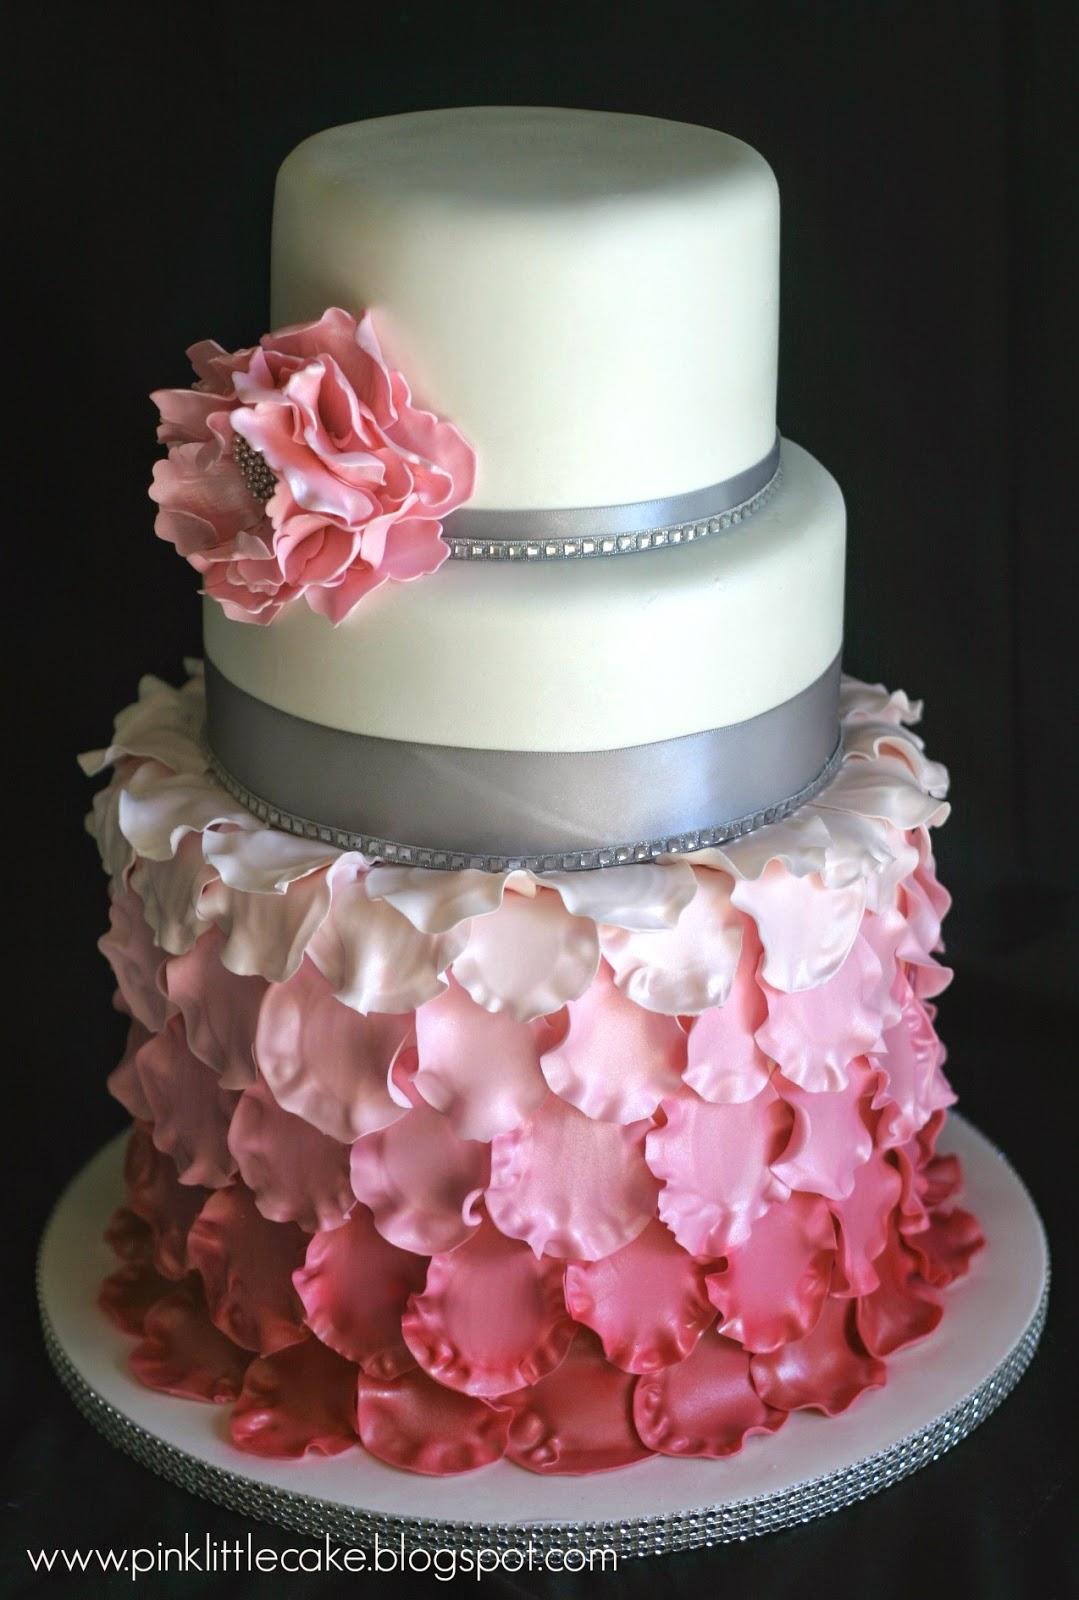 Rose Petal Cake Images : My Pink Little Cake: Petal Baptism Cake